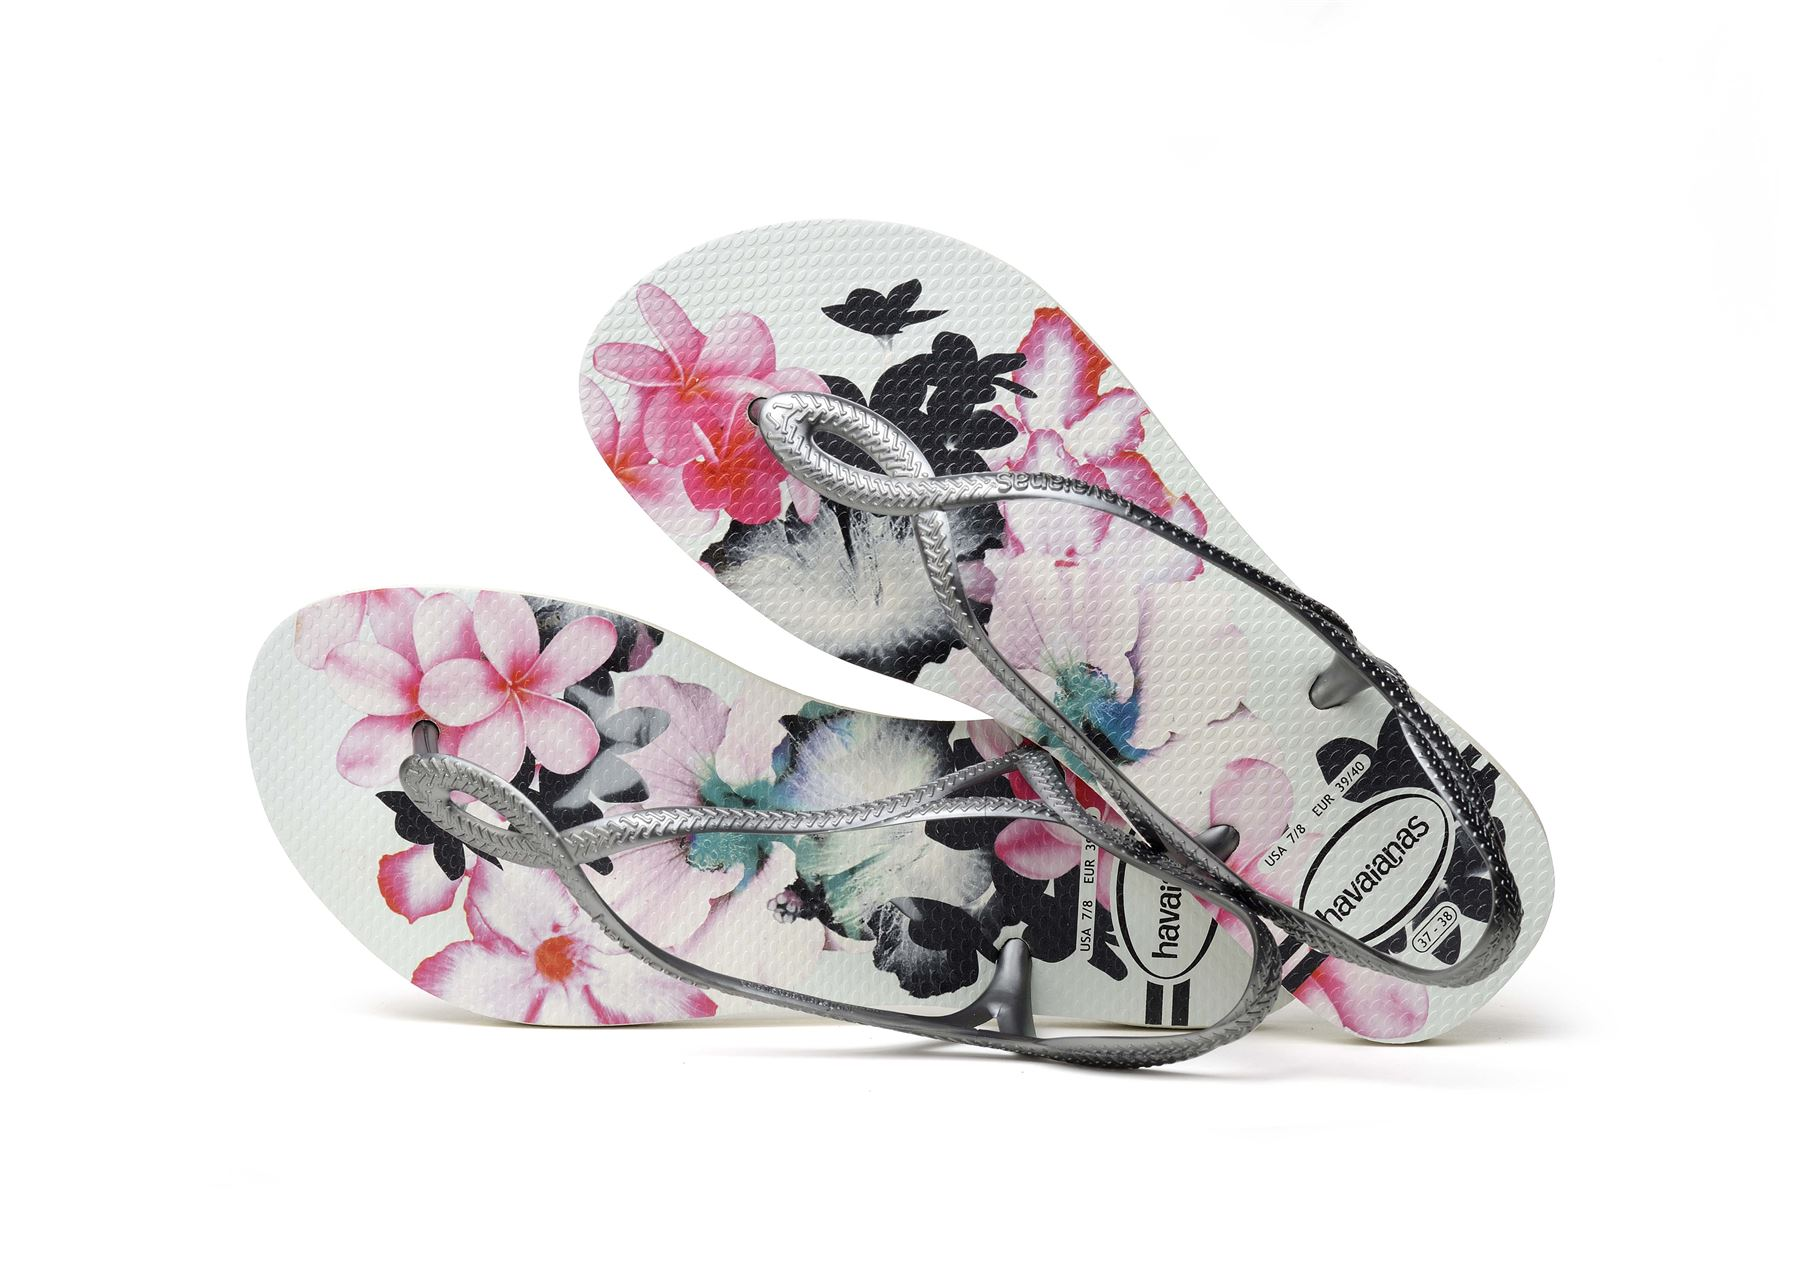 6be58e6b3 Havaianas Luna Floral Print Flip Flops Beach Pool Sling Back Strap ...